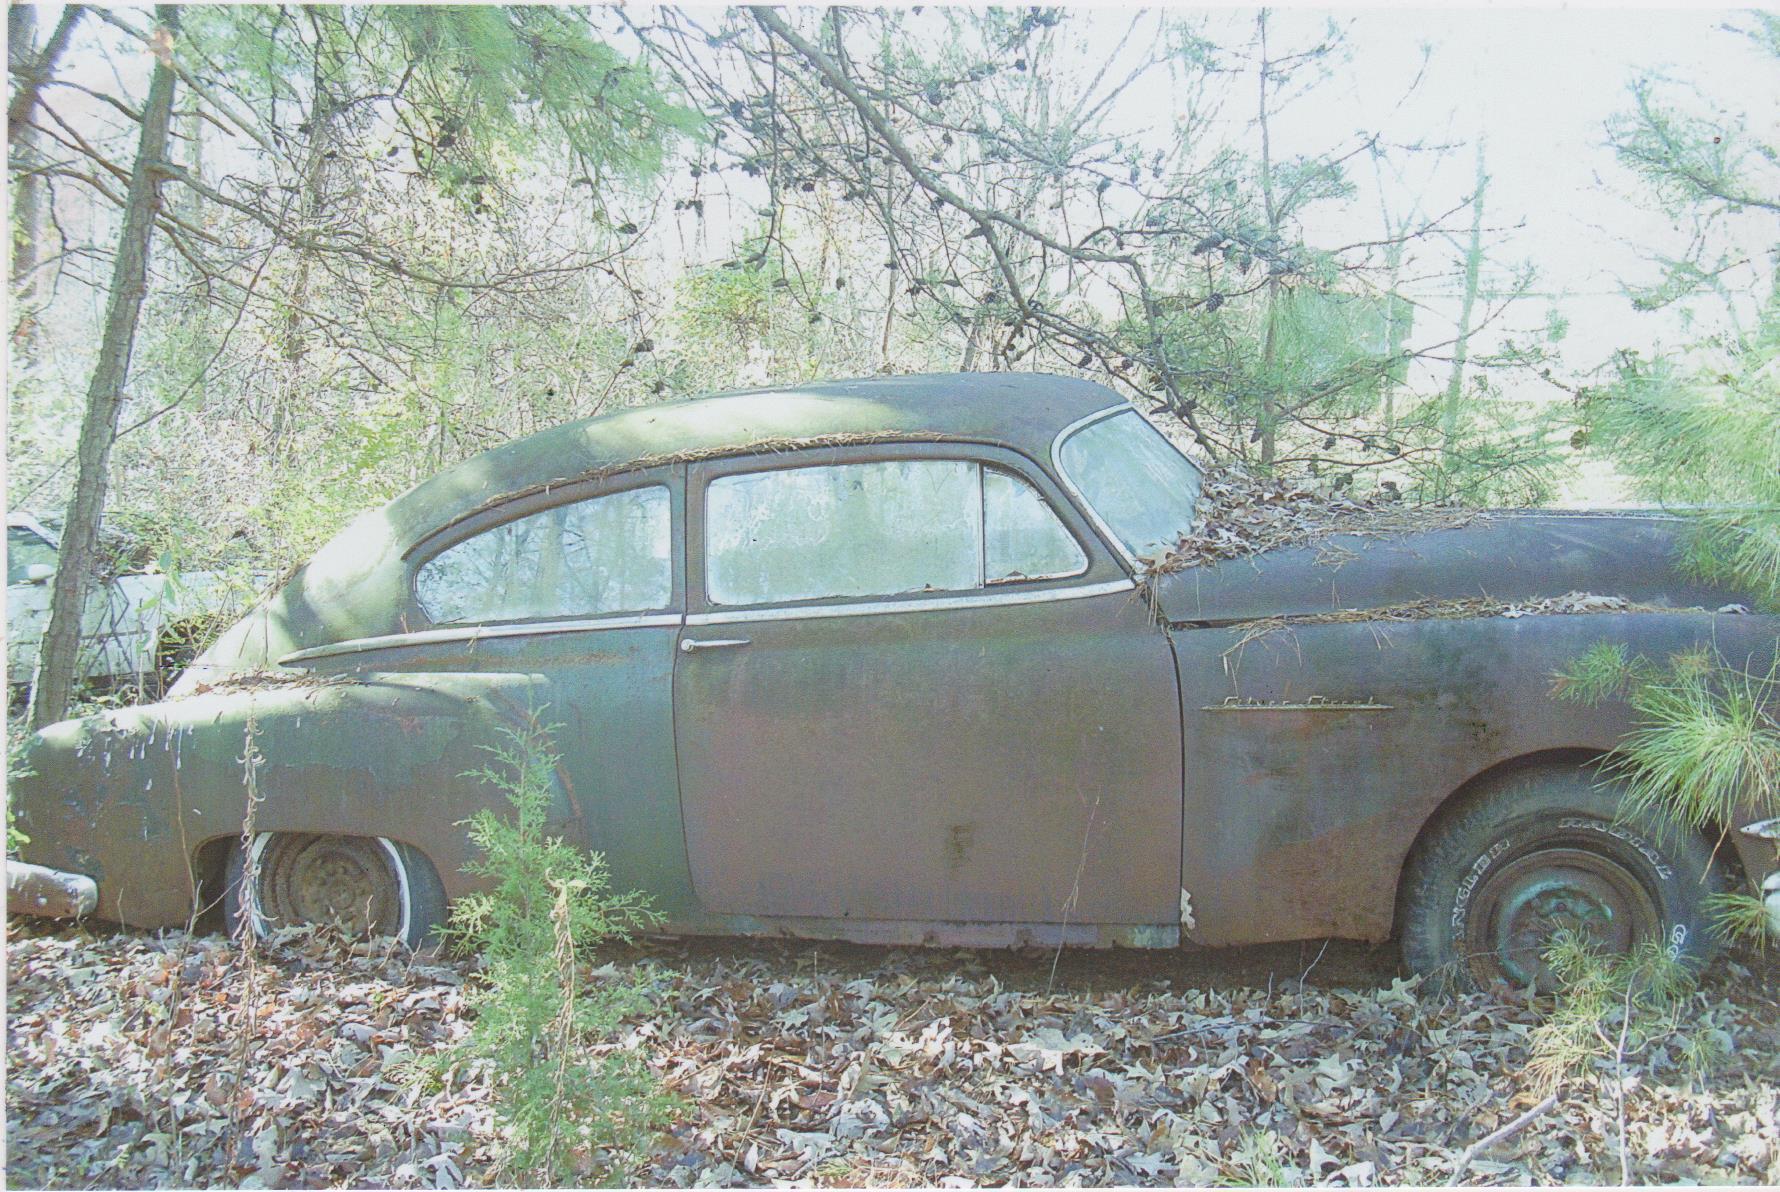 Click image for larger version  Name:Pontiac Silver Streak 001.jpg Views:75 Size:445.0 KB ID:75815